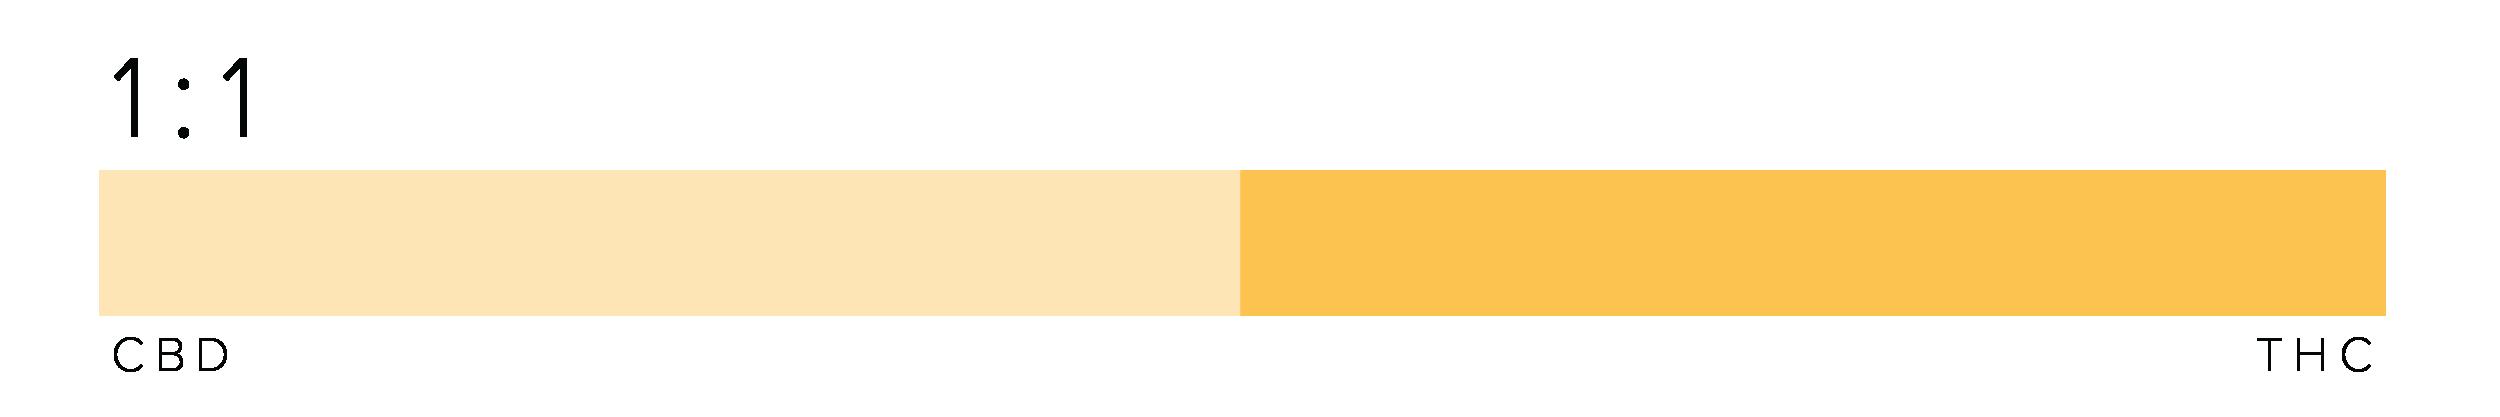 Uplift 1:1 Graph